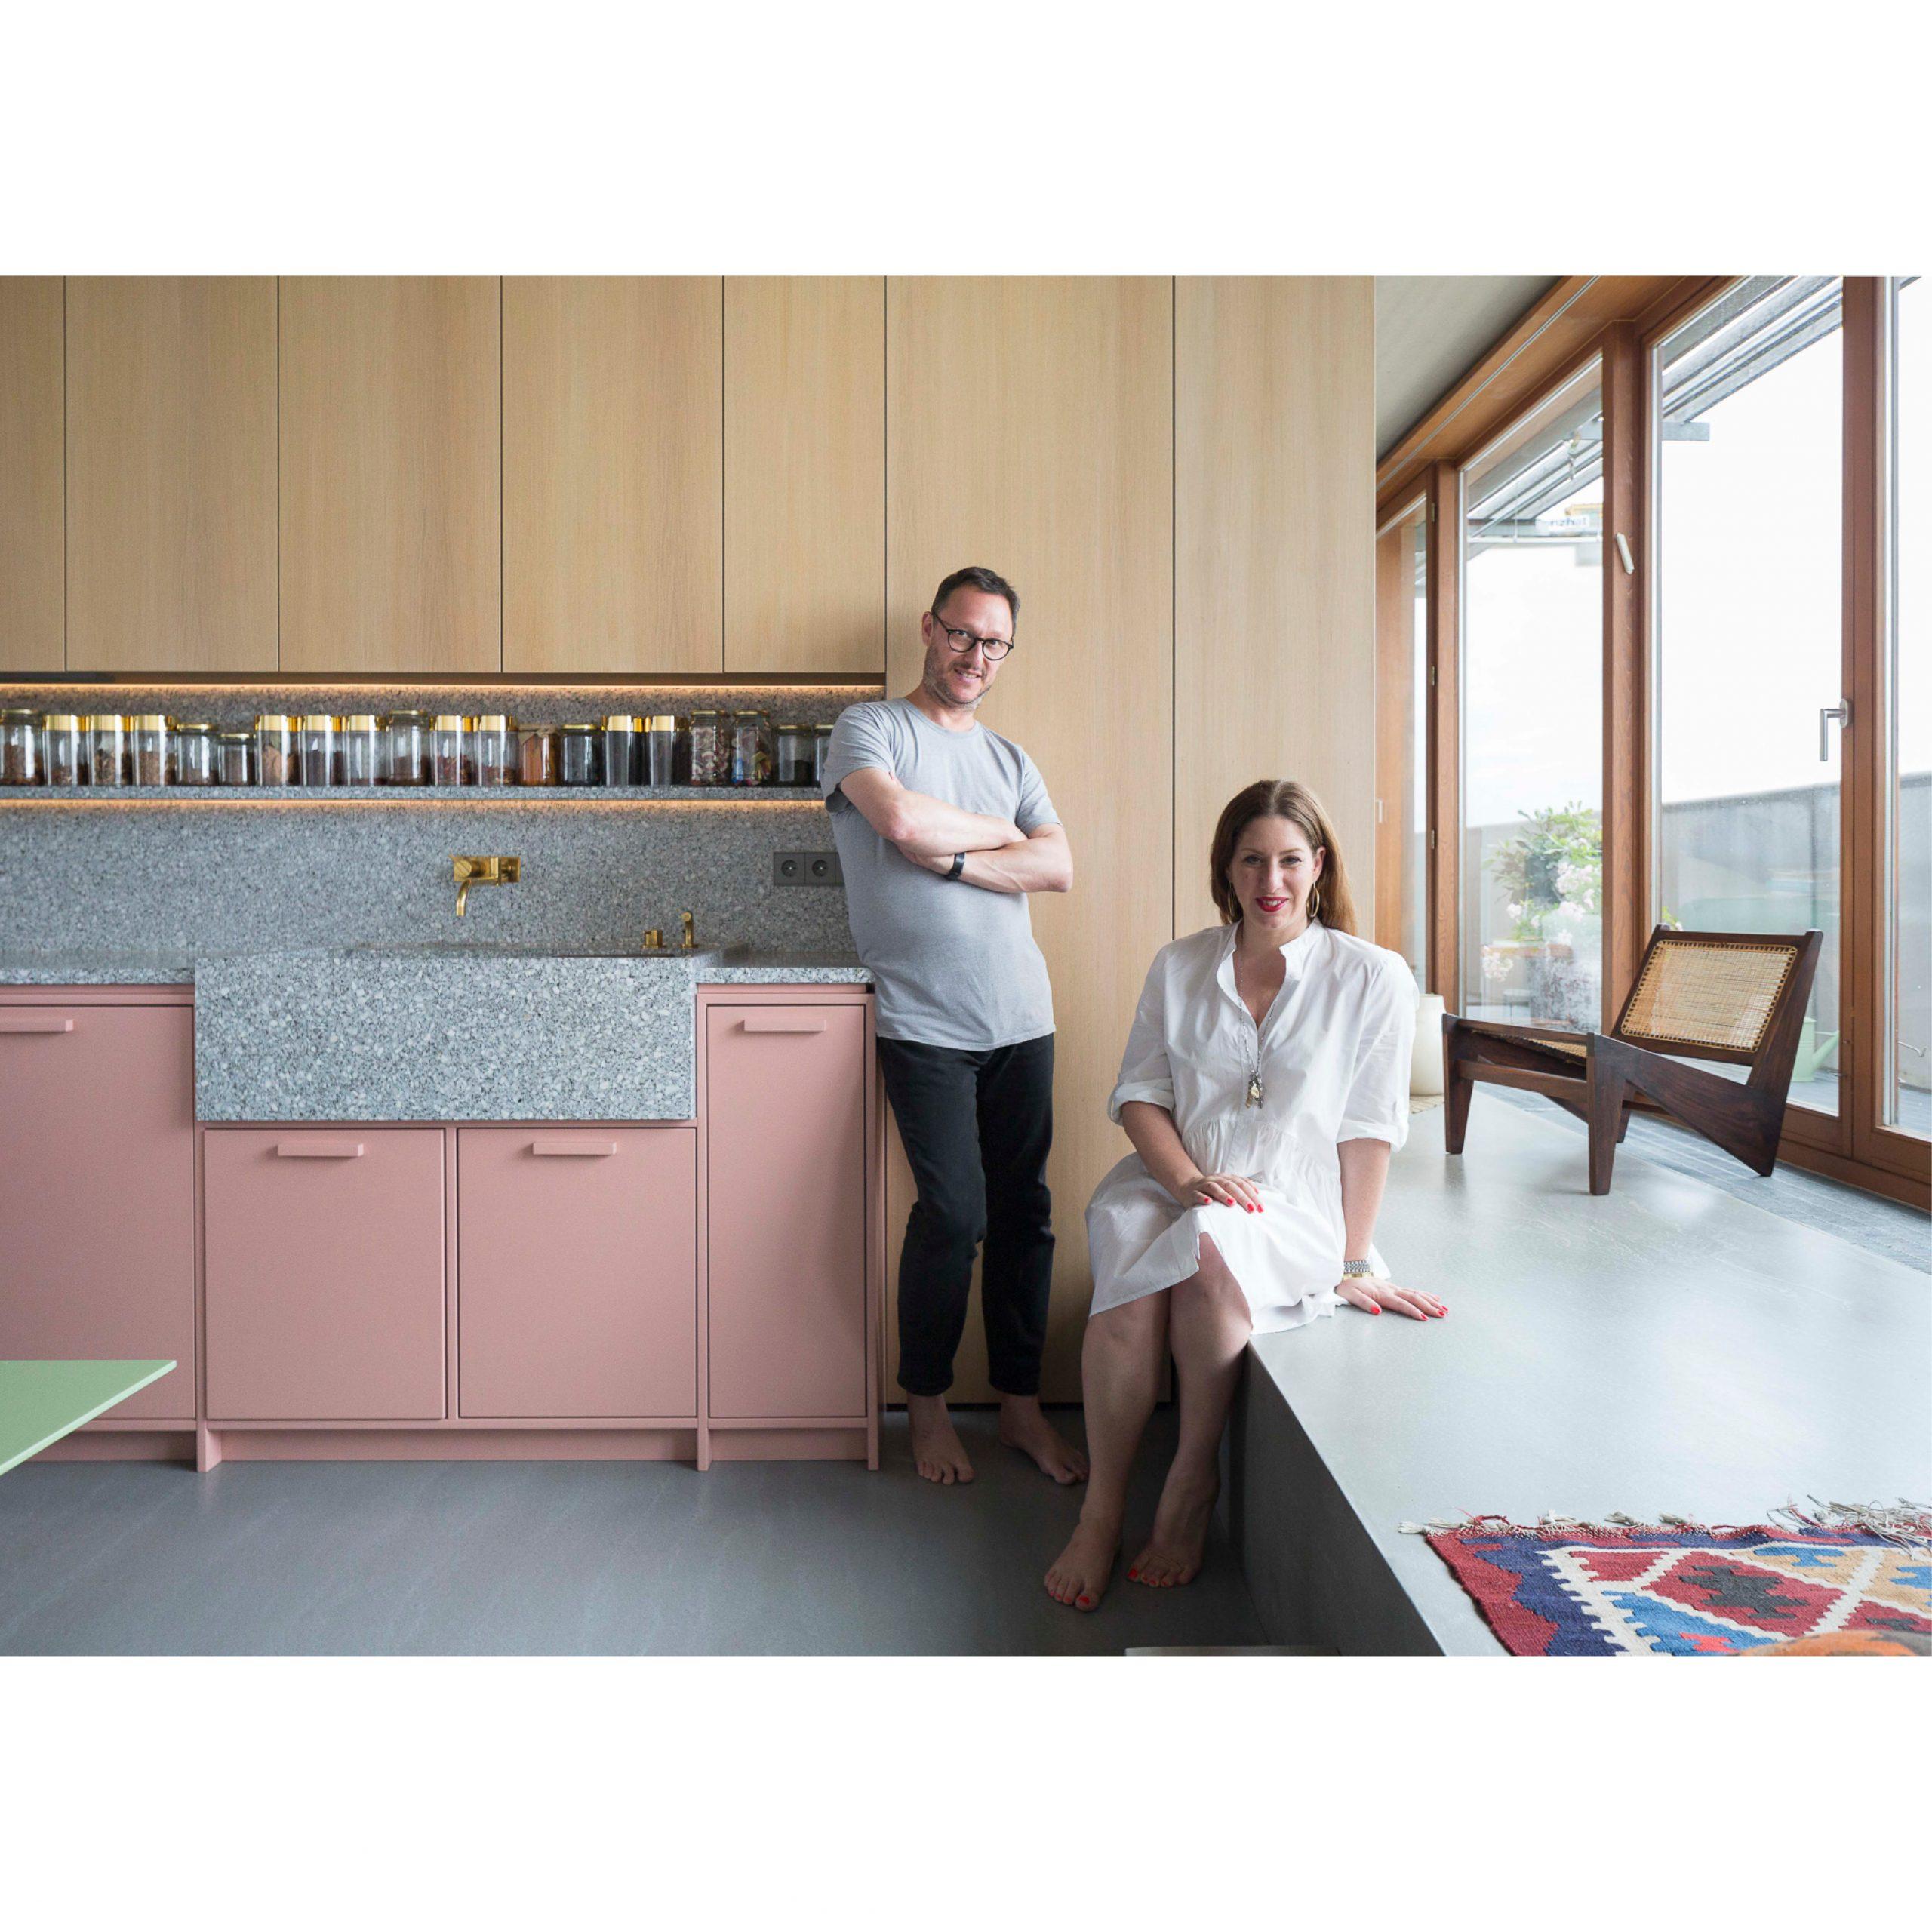 Ester Bruzkus Interior Kitchen ©Caroline Prange_4